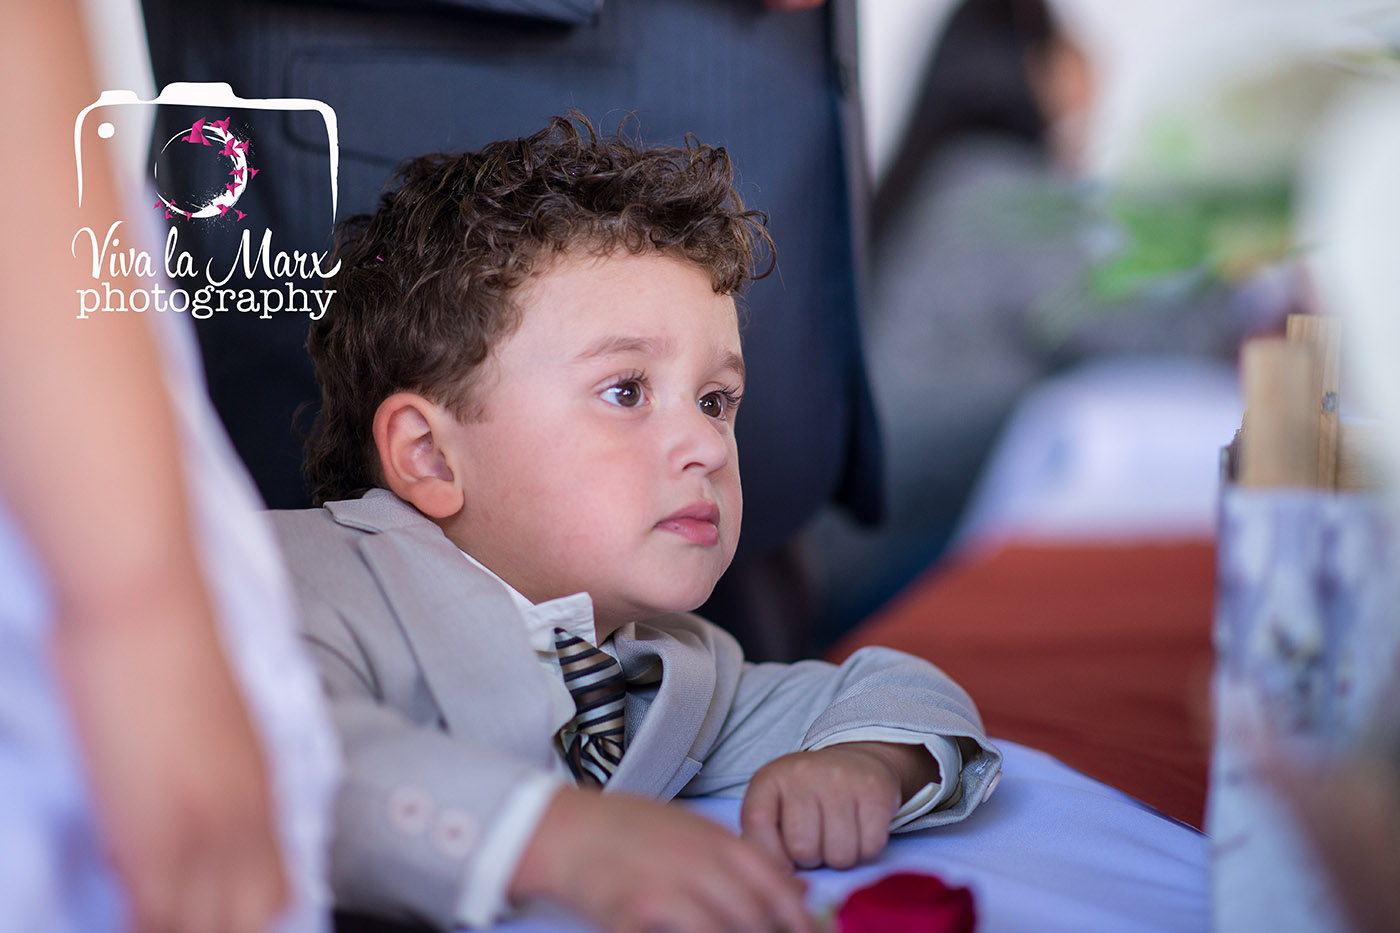 First son, Demetrio, watching a wedding, his parents wedding.